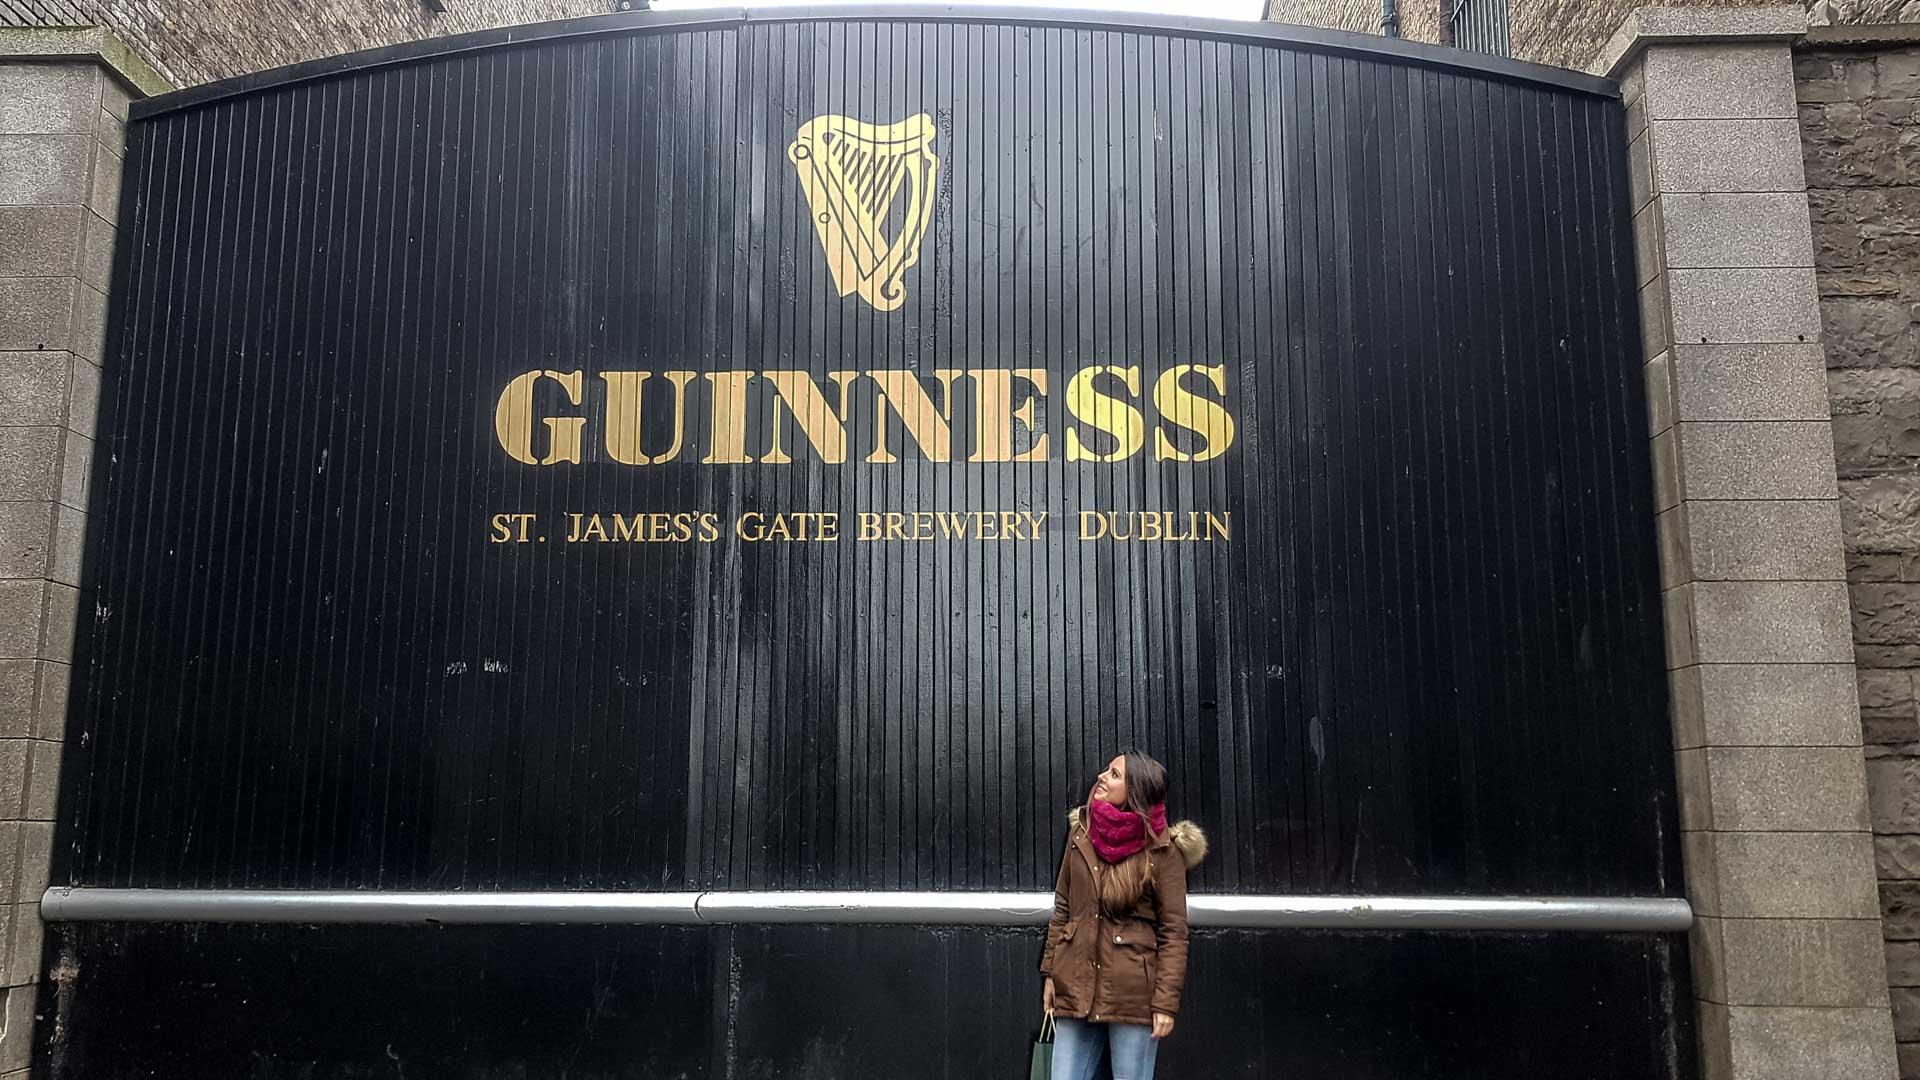 Entrada de la Guinness Storehouse, Dublín, Irlanda